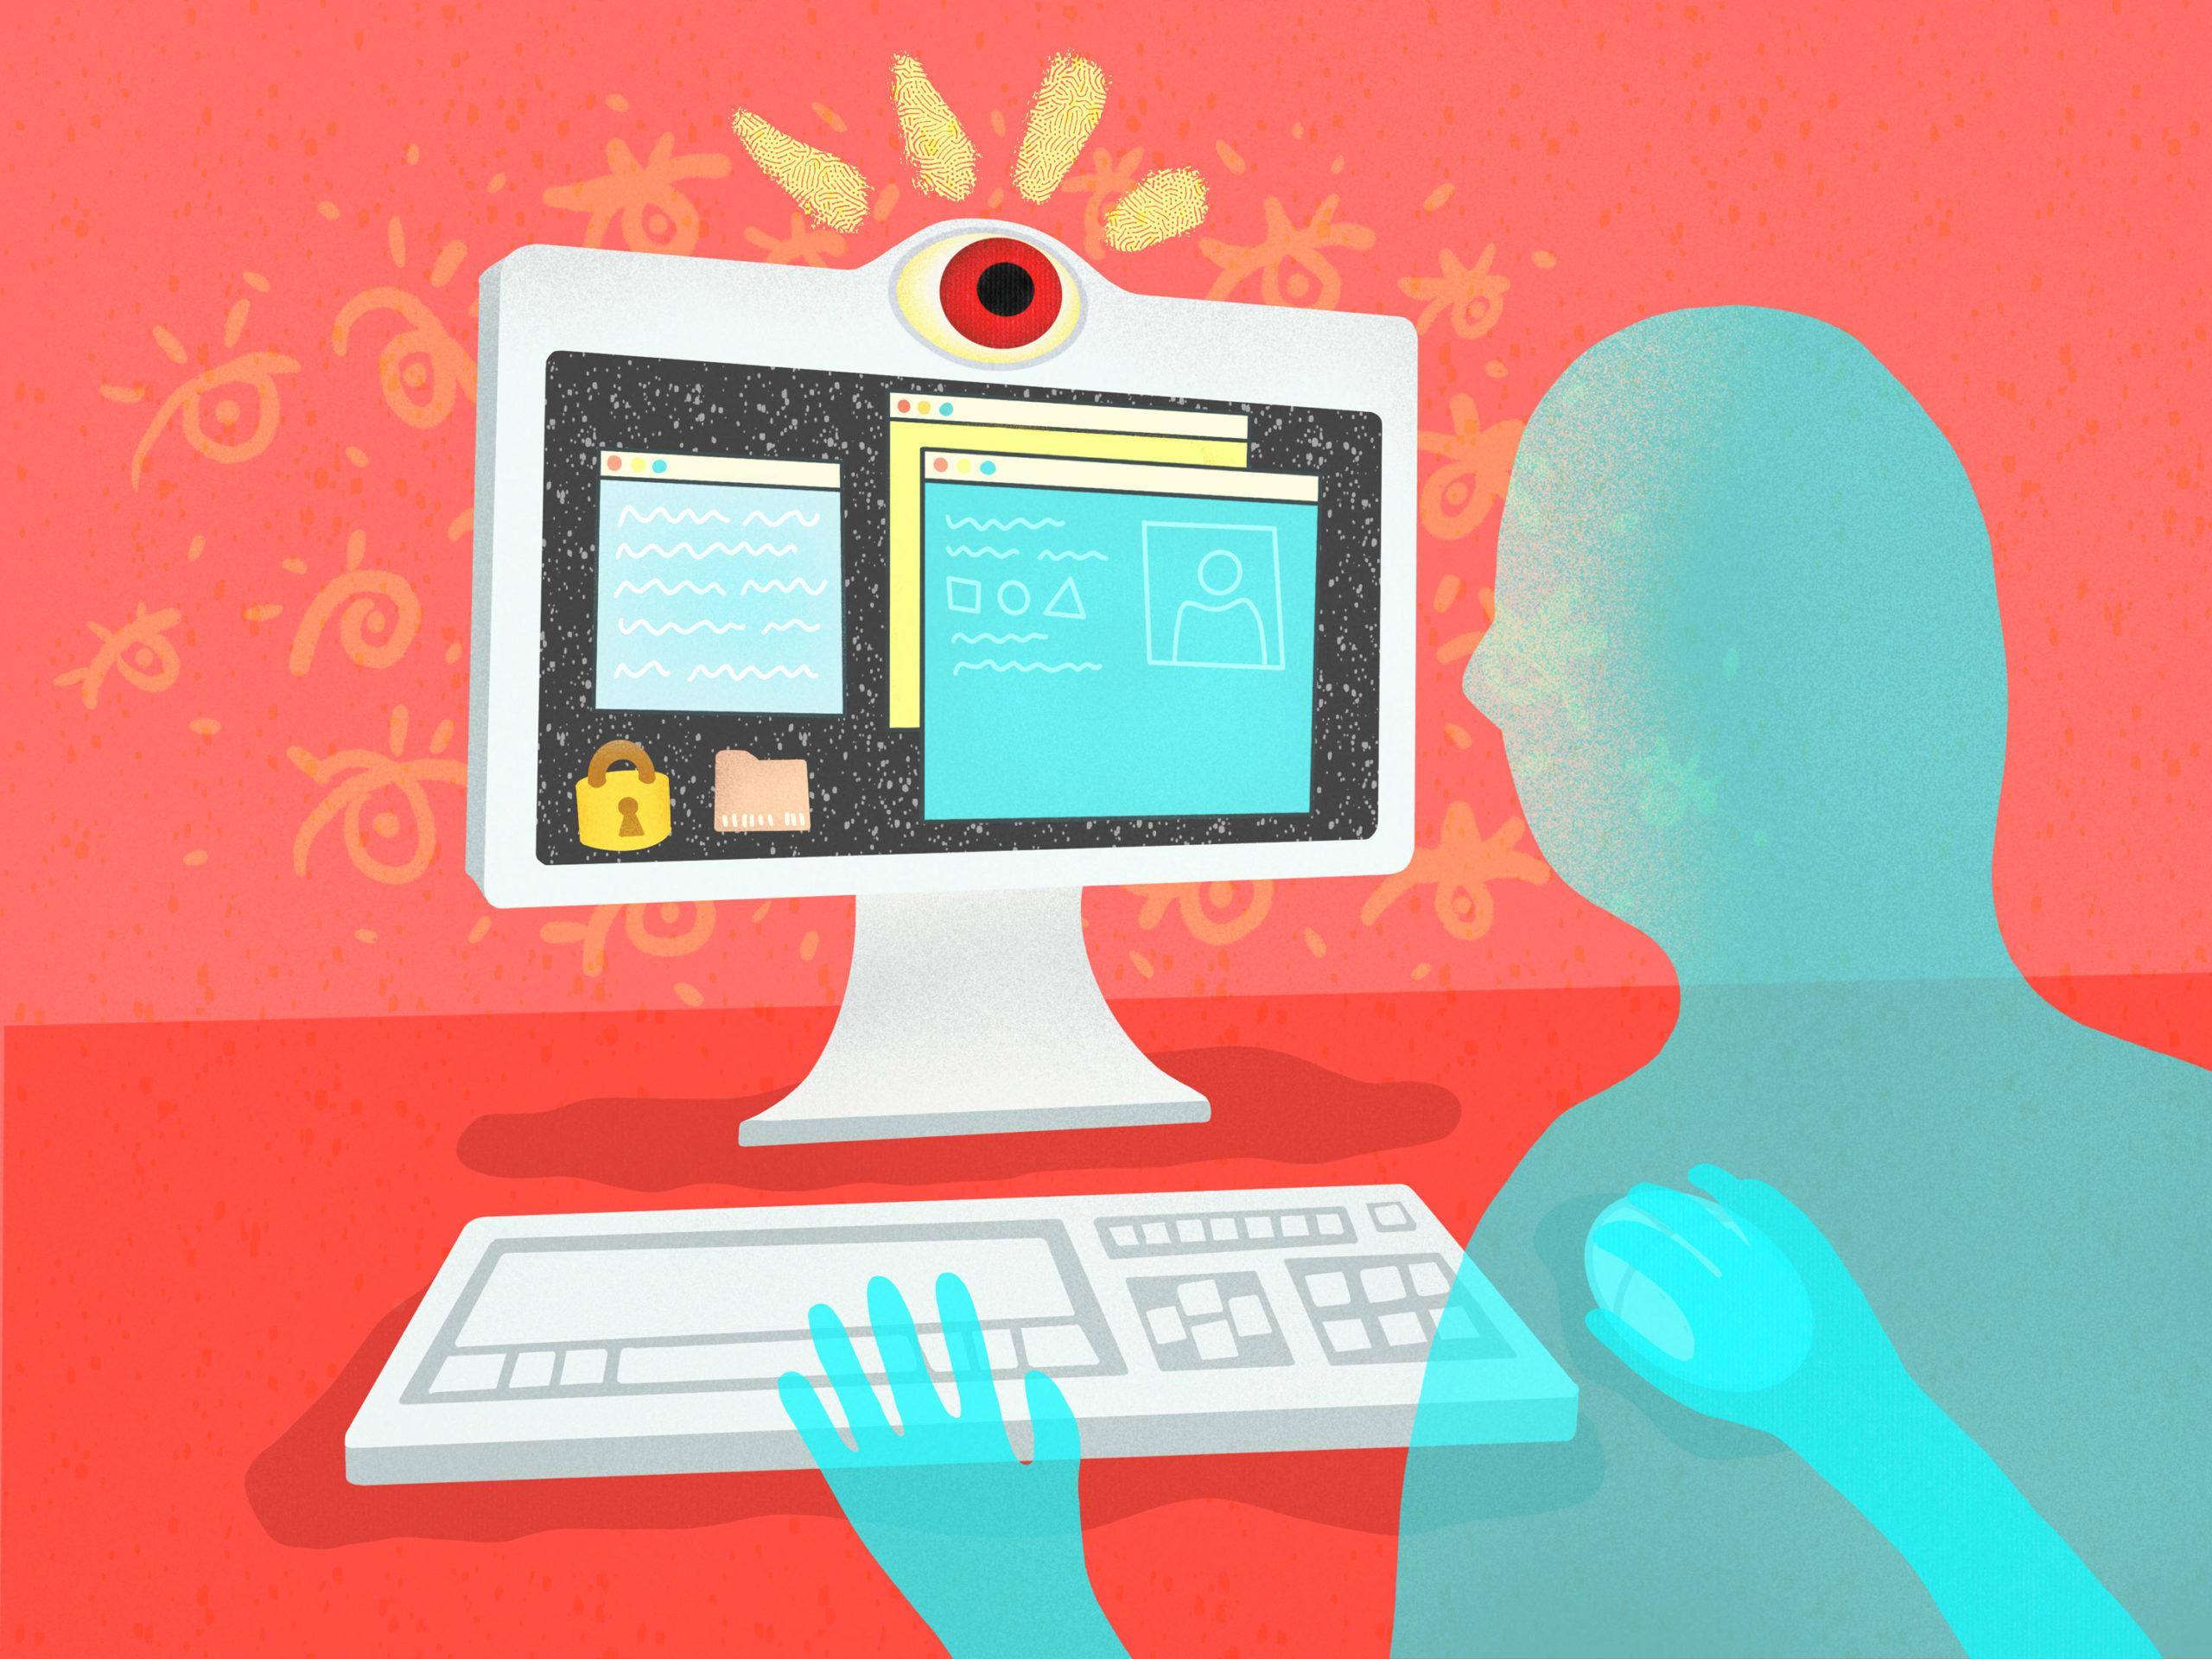 Virtual exam using Respondus proctoring software